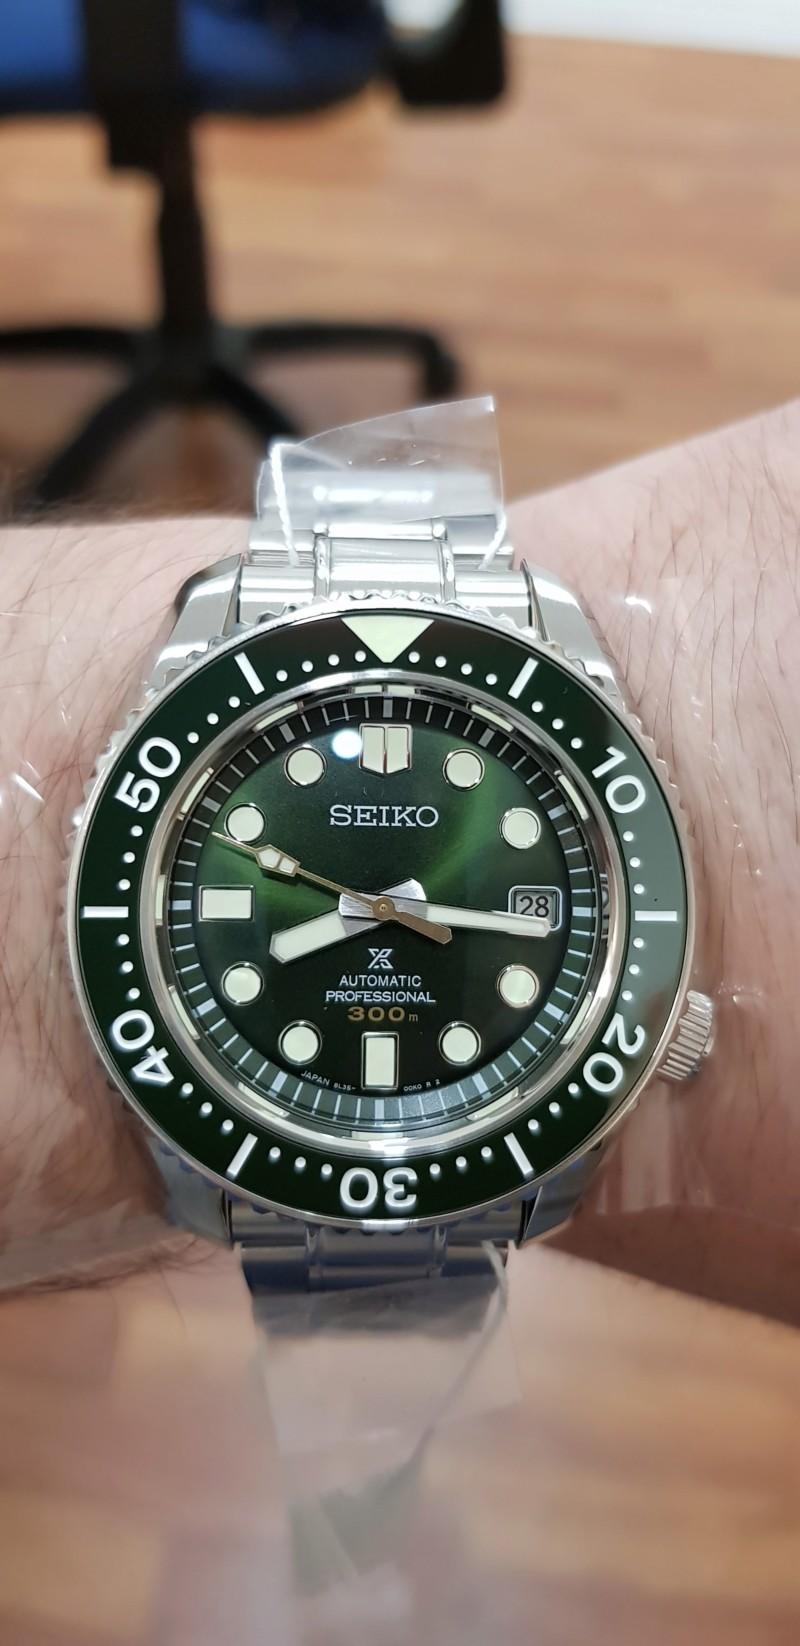 Seiko mm300 GREEN - Página 3 20180617